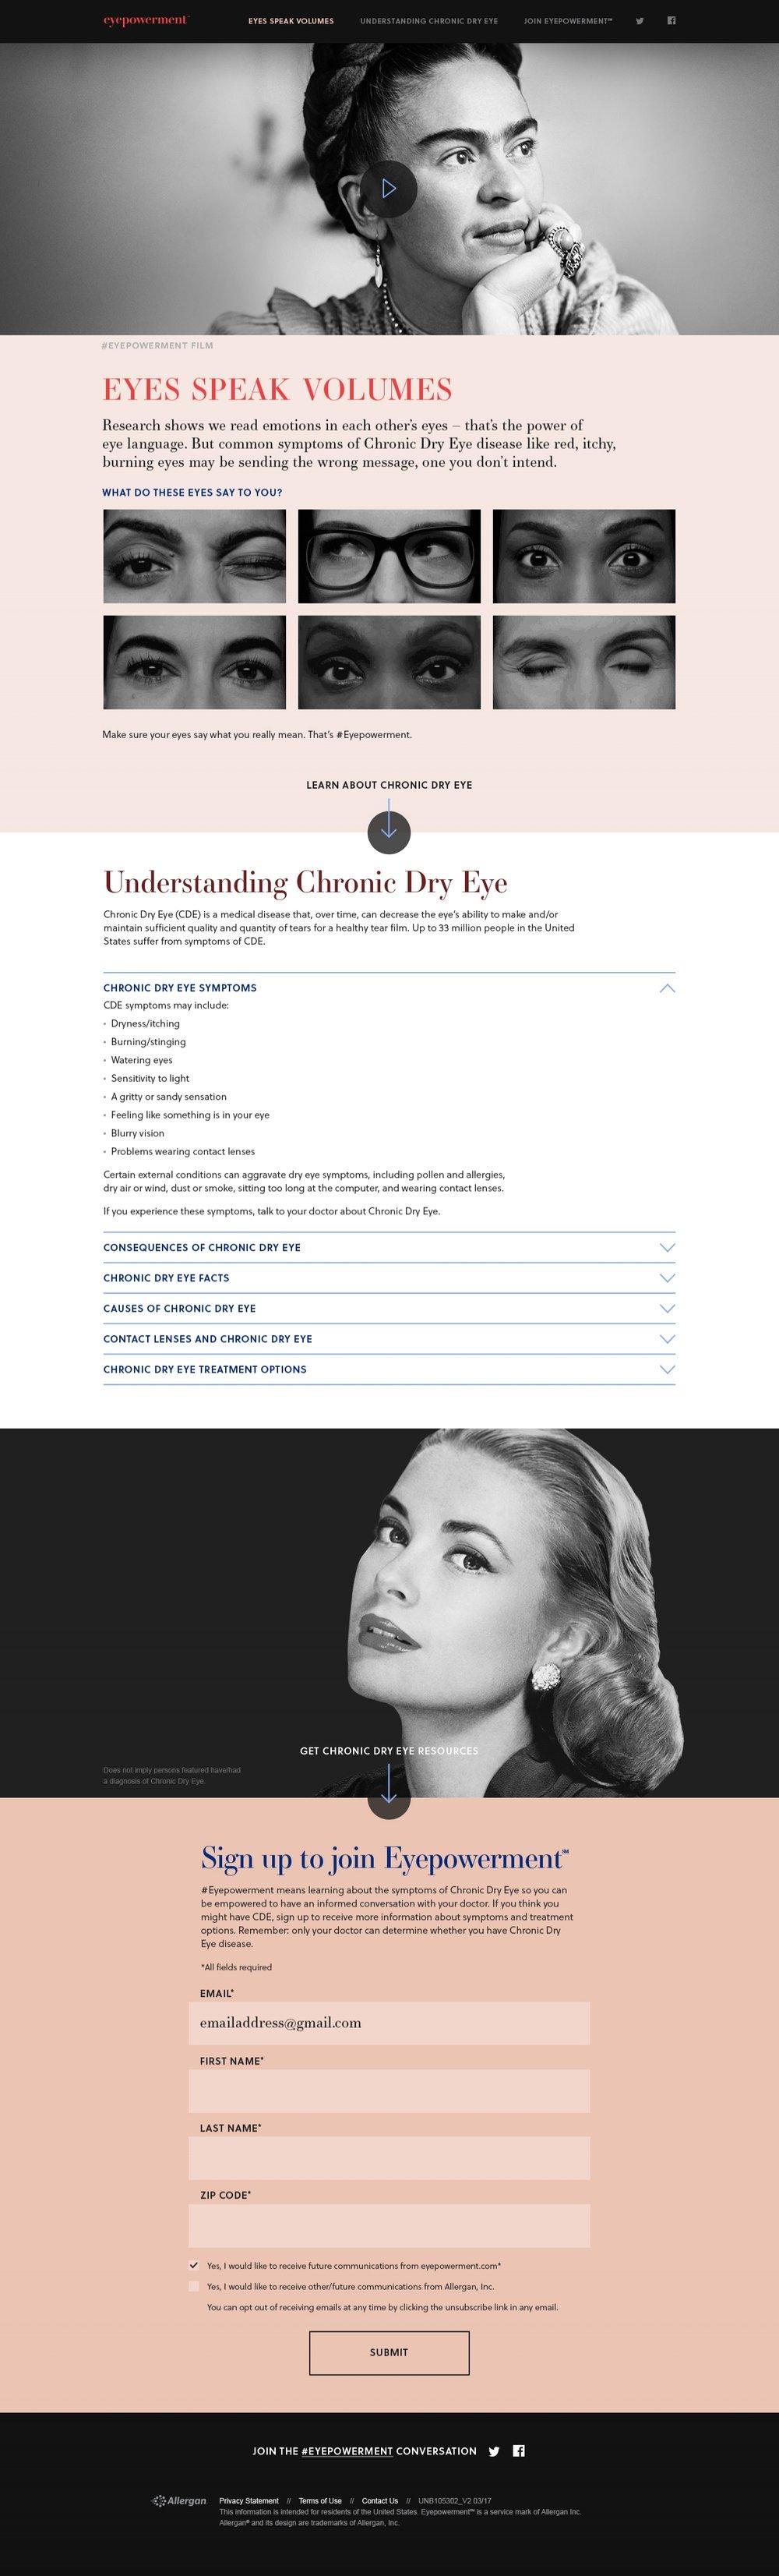 eyepowerment.com page